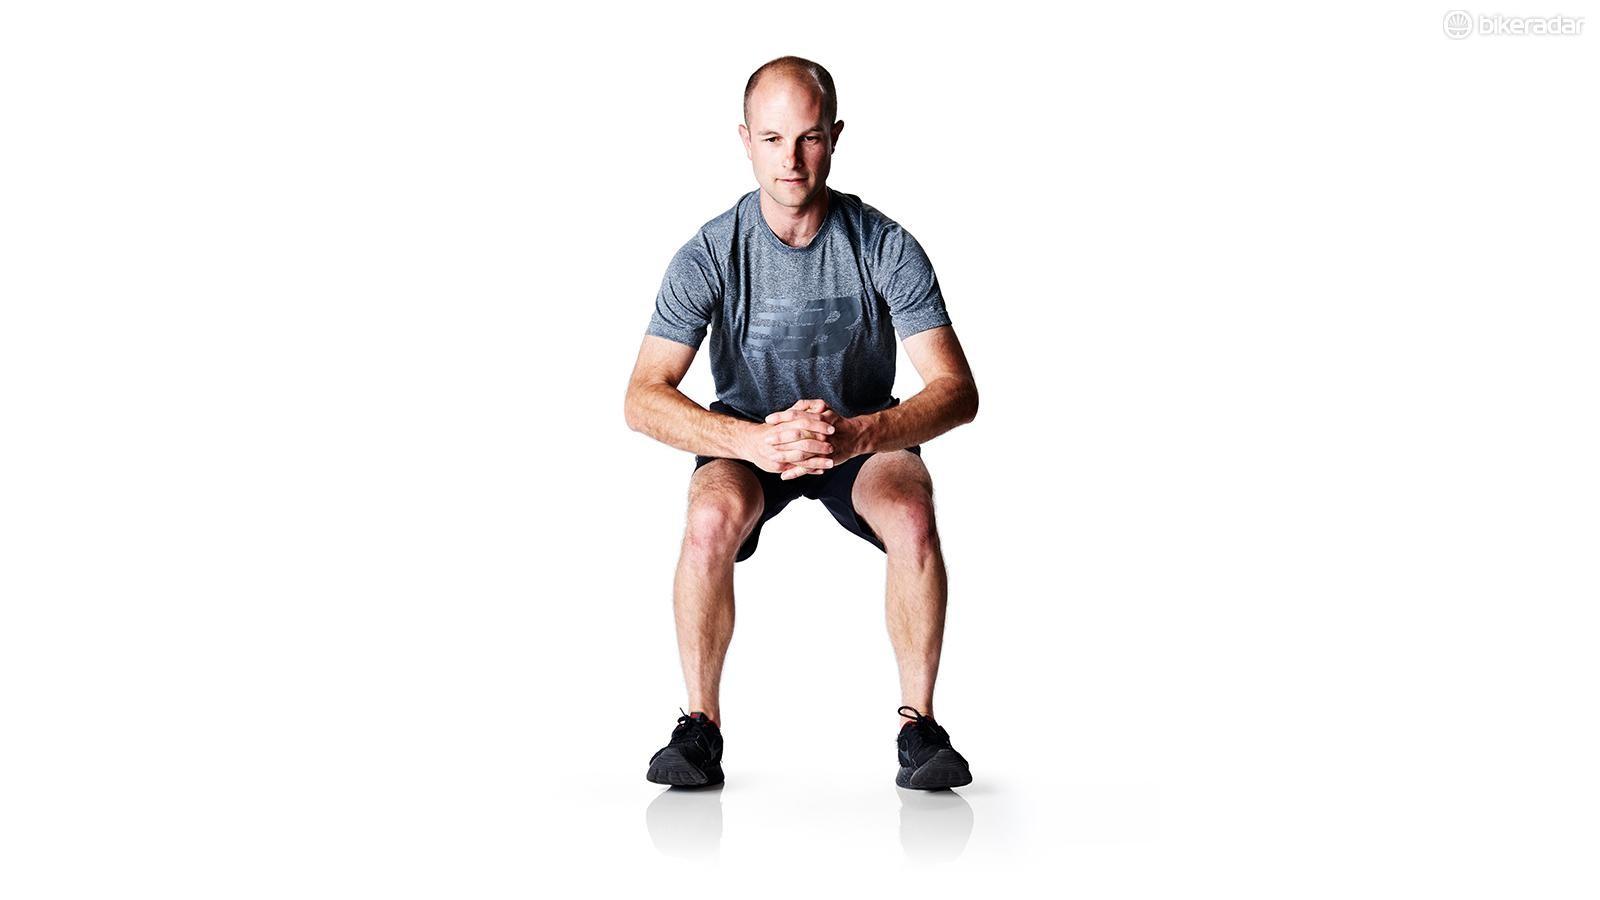 3. Basic strength